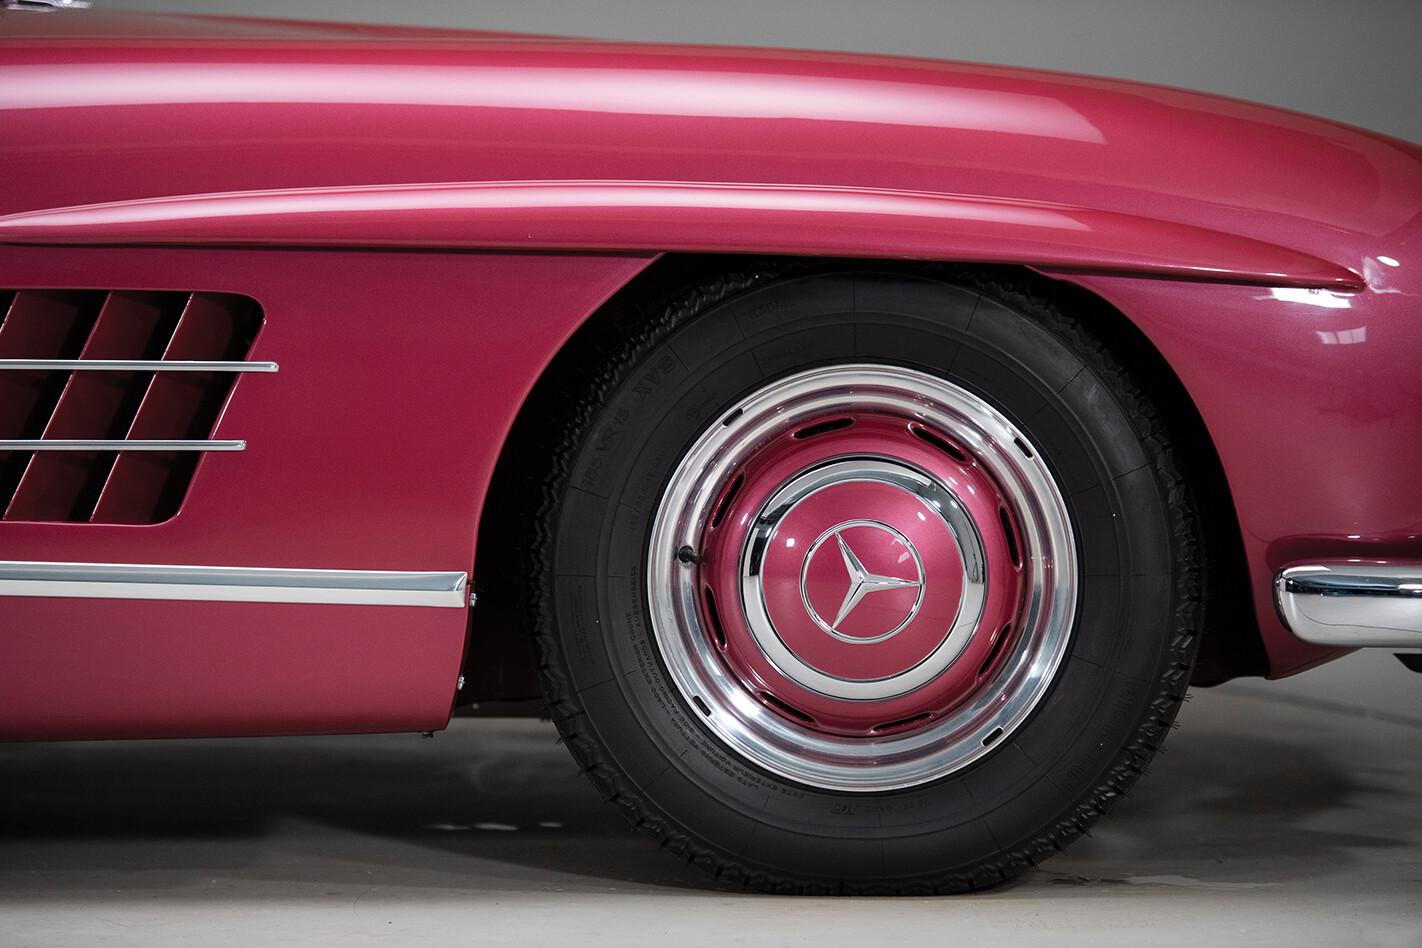 1954 Mercedes-Benz 300 SL wheel